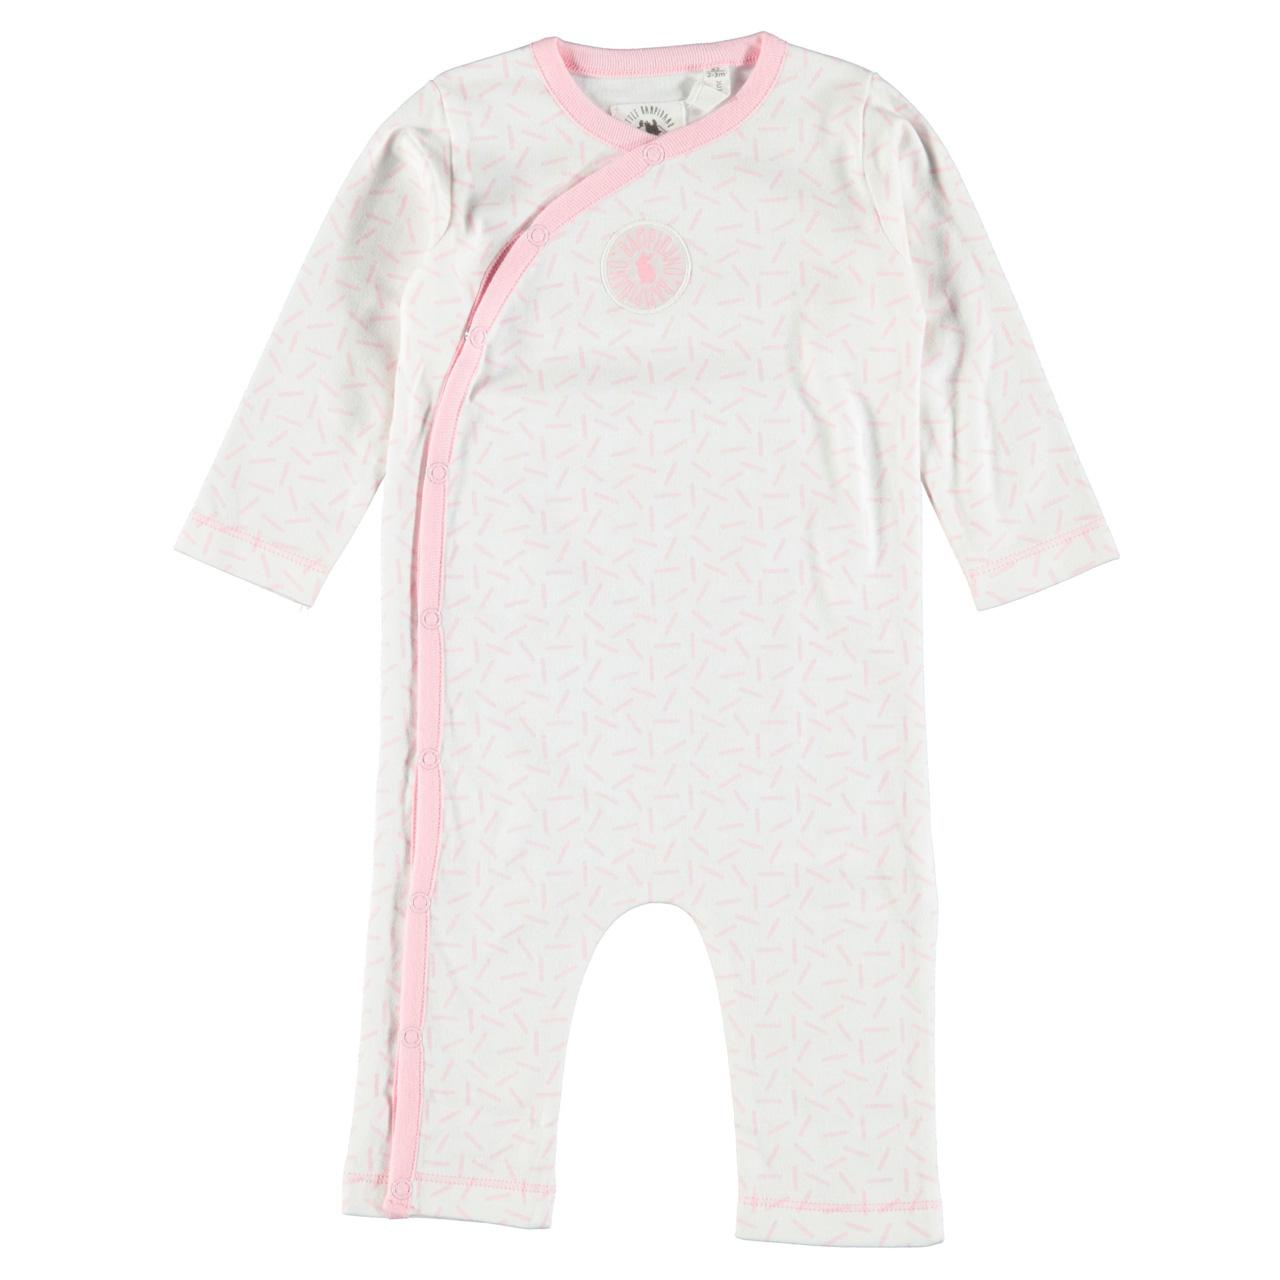 Roze Babykleding.Bampidano G A707 9006 Roze Babykleding Meisjes Irma Mode